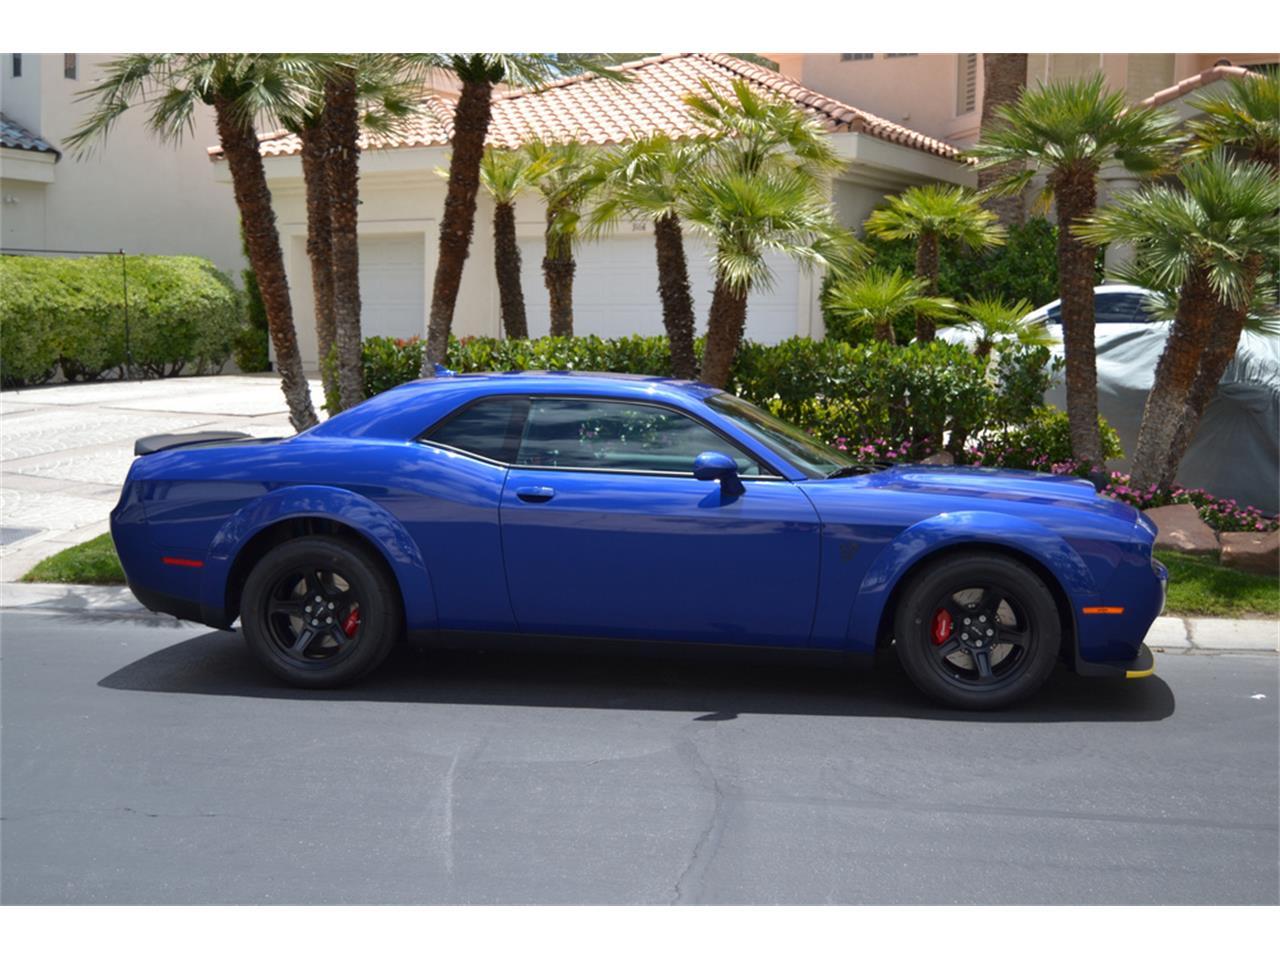 Large Picture of '18 Dodge Challenger SRT Demon Offered by Barrett-Jackson - QUTI